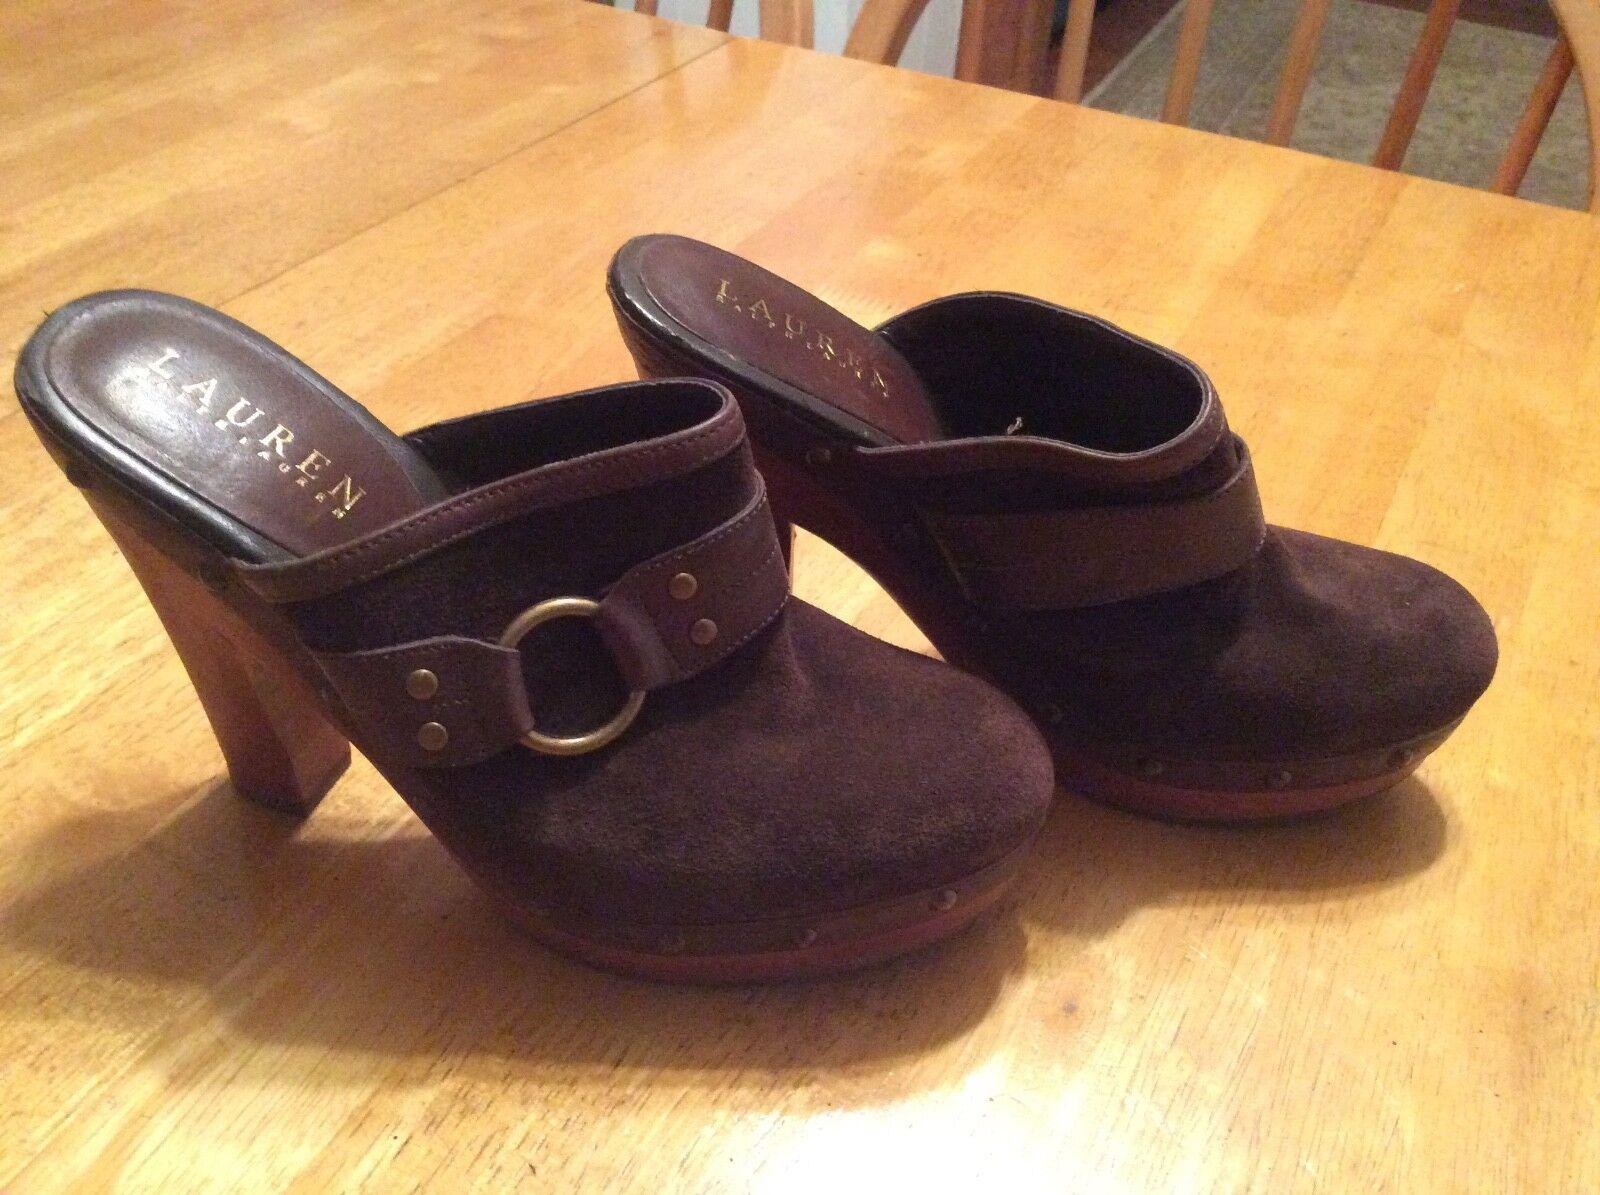 in linea Ralph LAUREN Marrone Suede Clogs Slides Mules scarpe scarpe scarpe Platform Wood Heel Dimensione 6.5  consegna gratuita e veloce disponibile